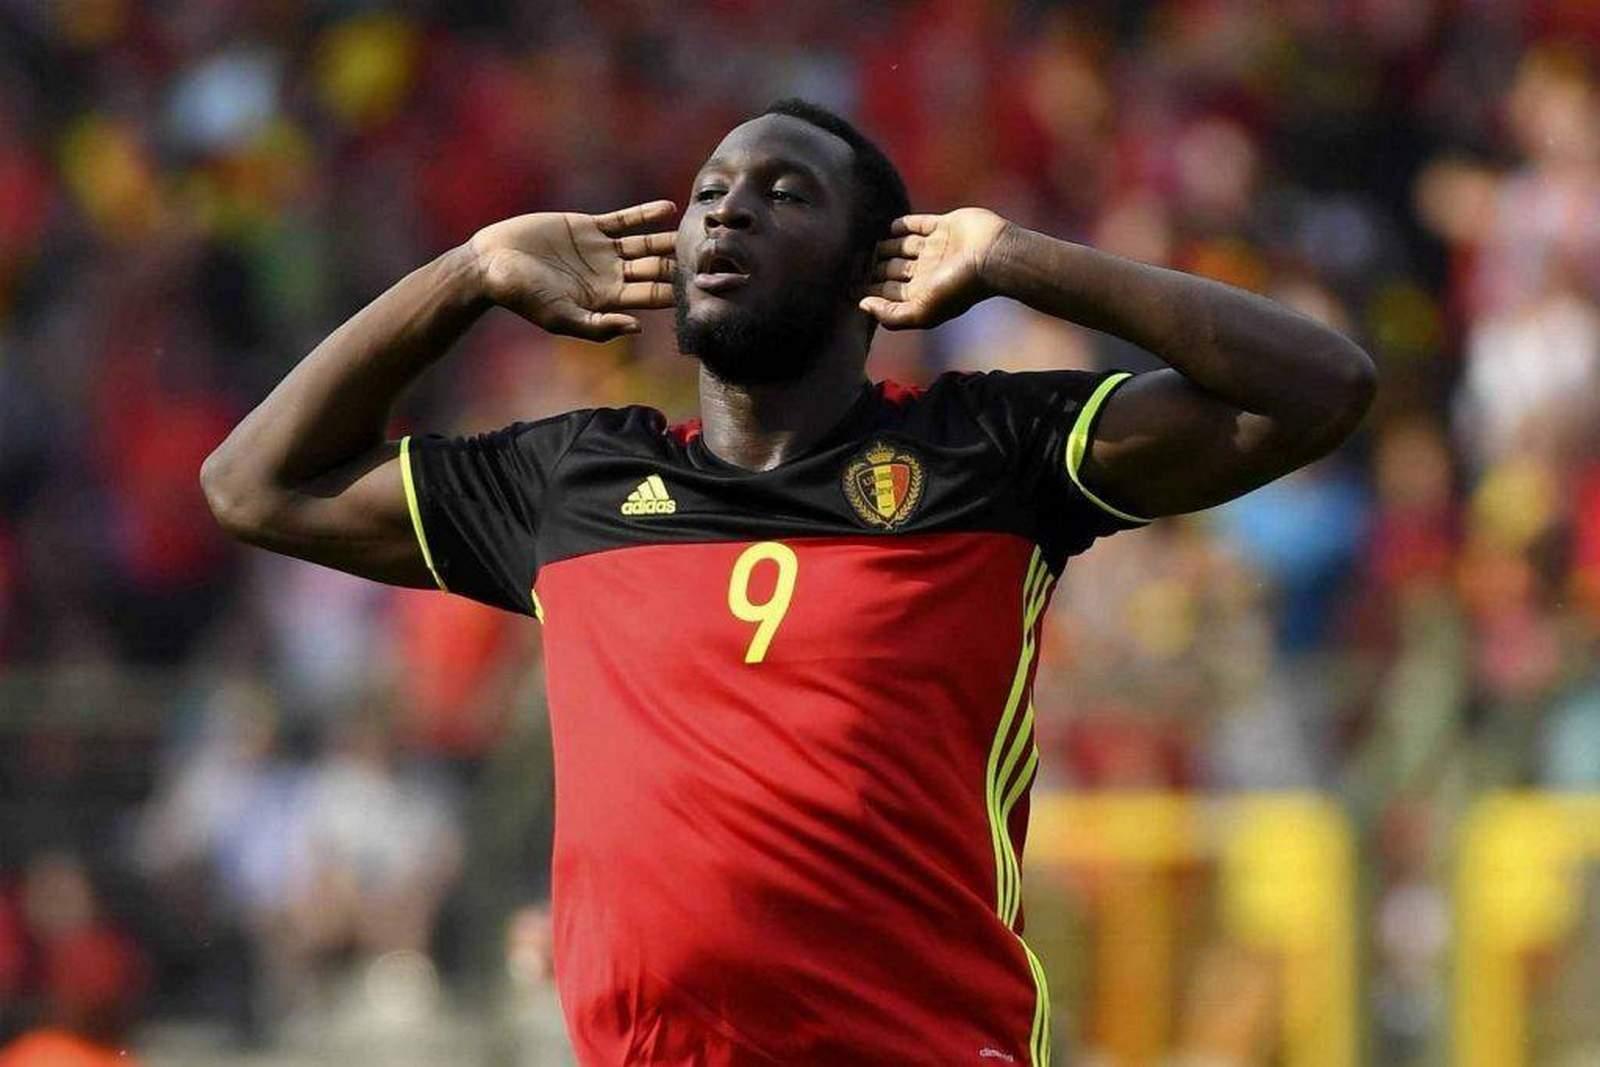 Jubelt Romelu Lukaku erneut? Jetzt auf Belgien gegen Tunesien wetten.